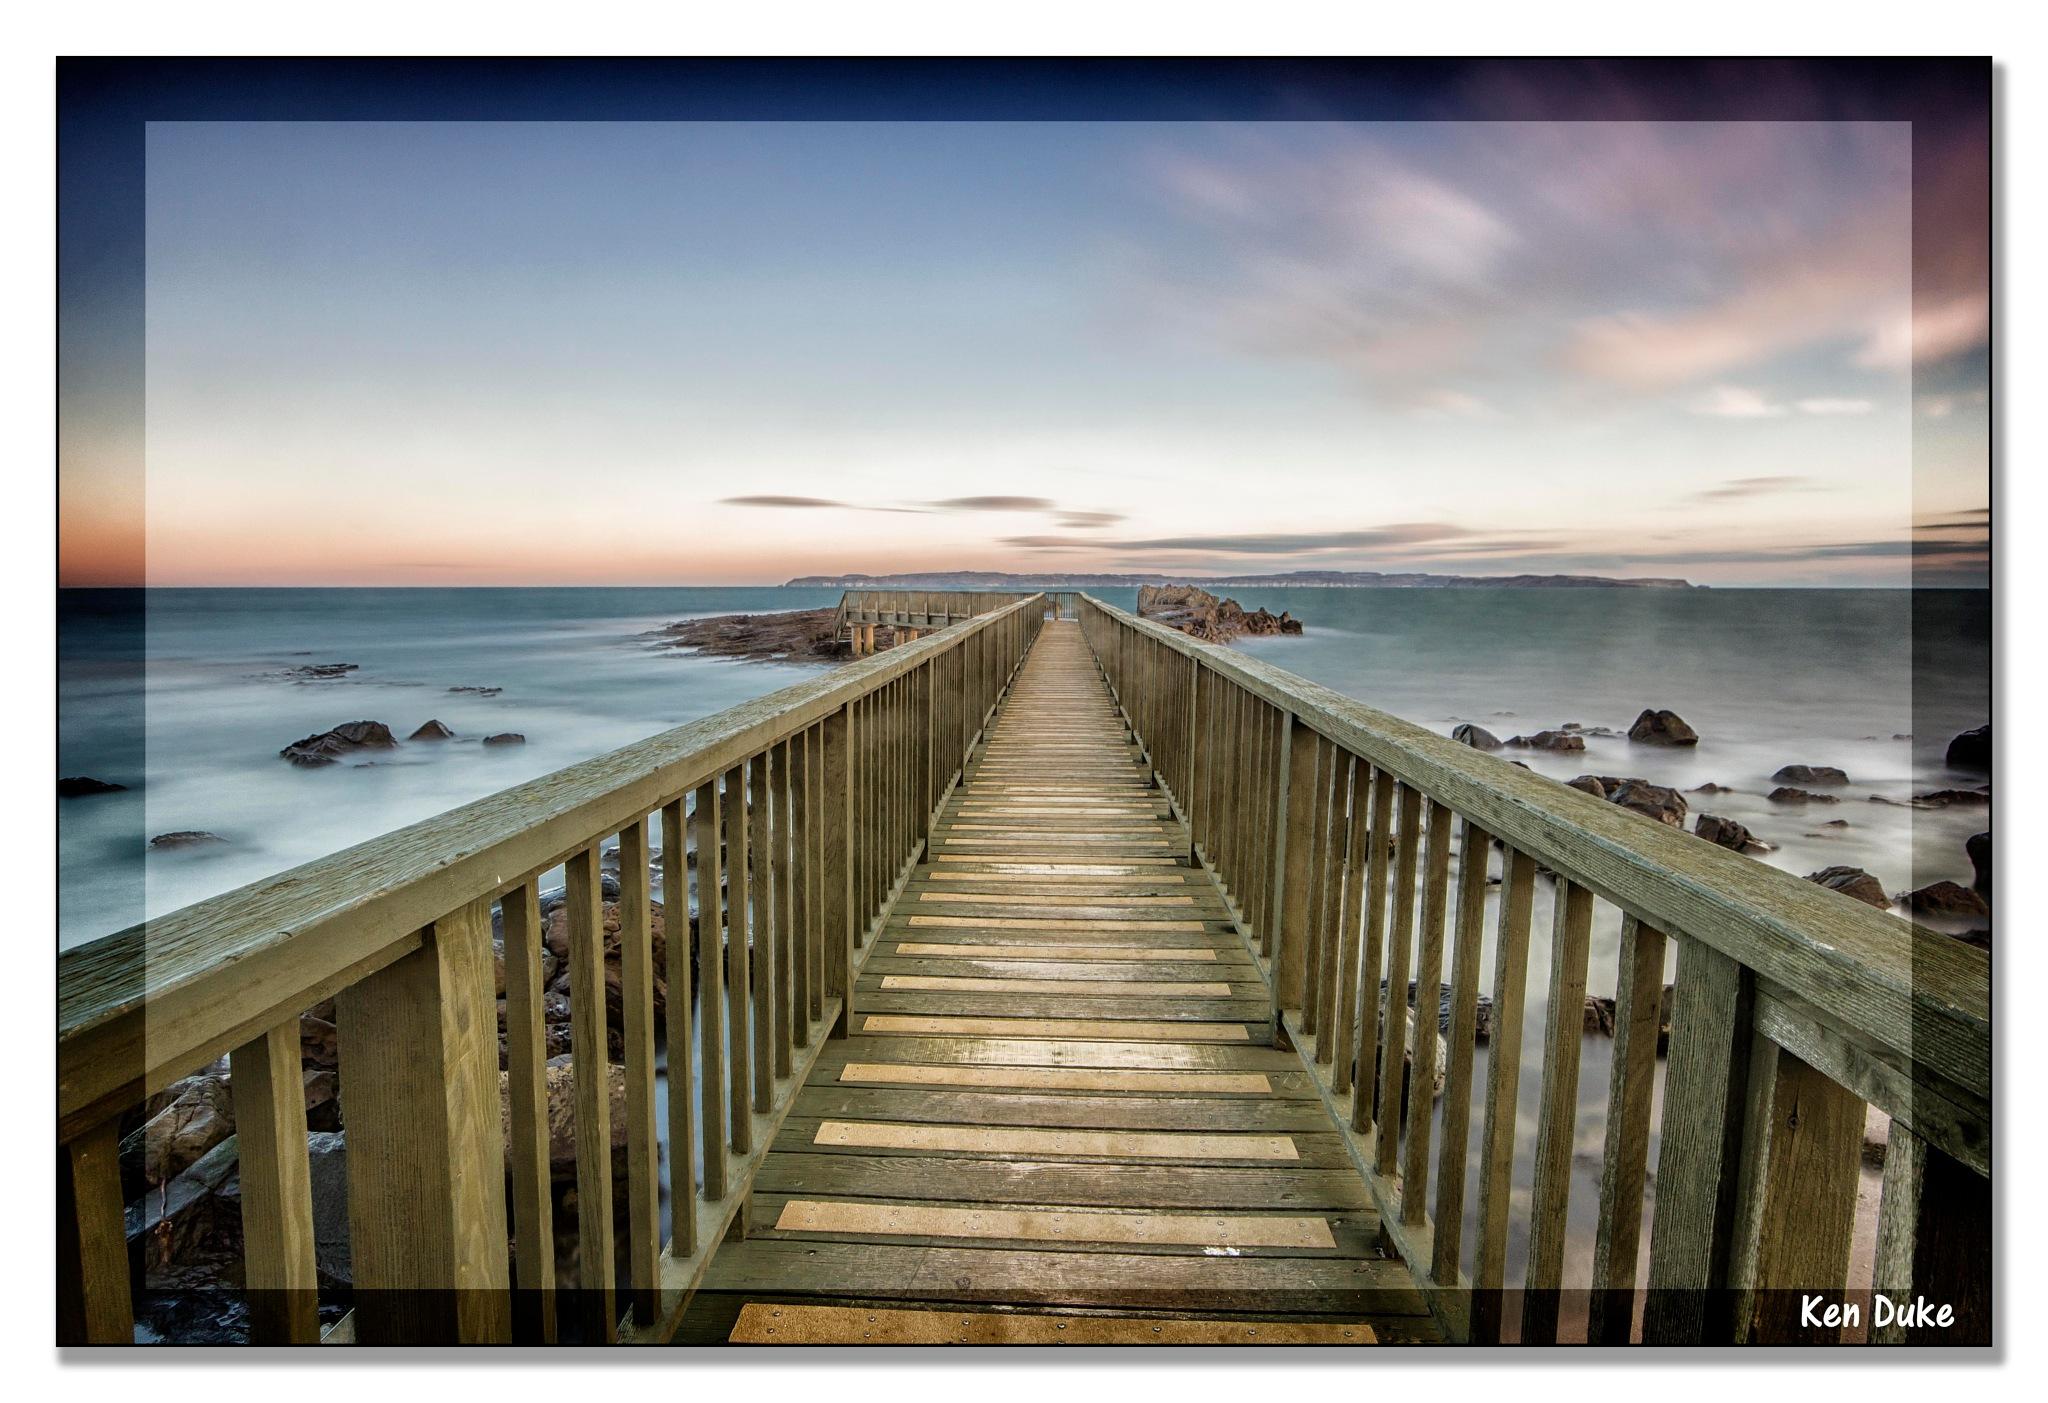 bridge to nowhere by KenDuke